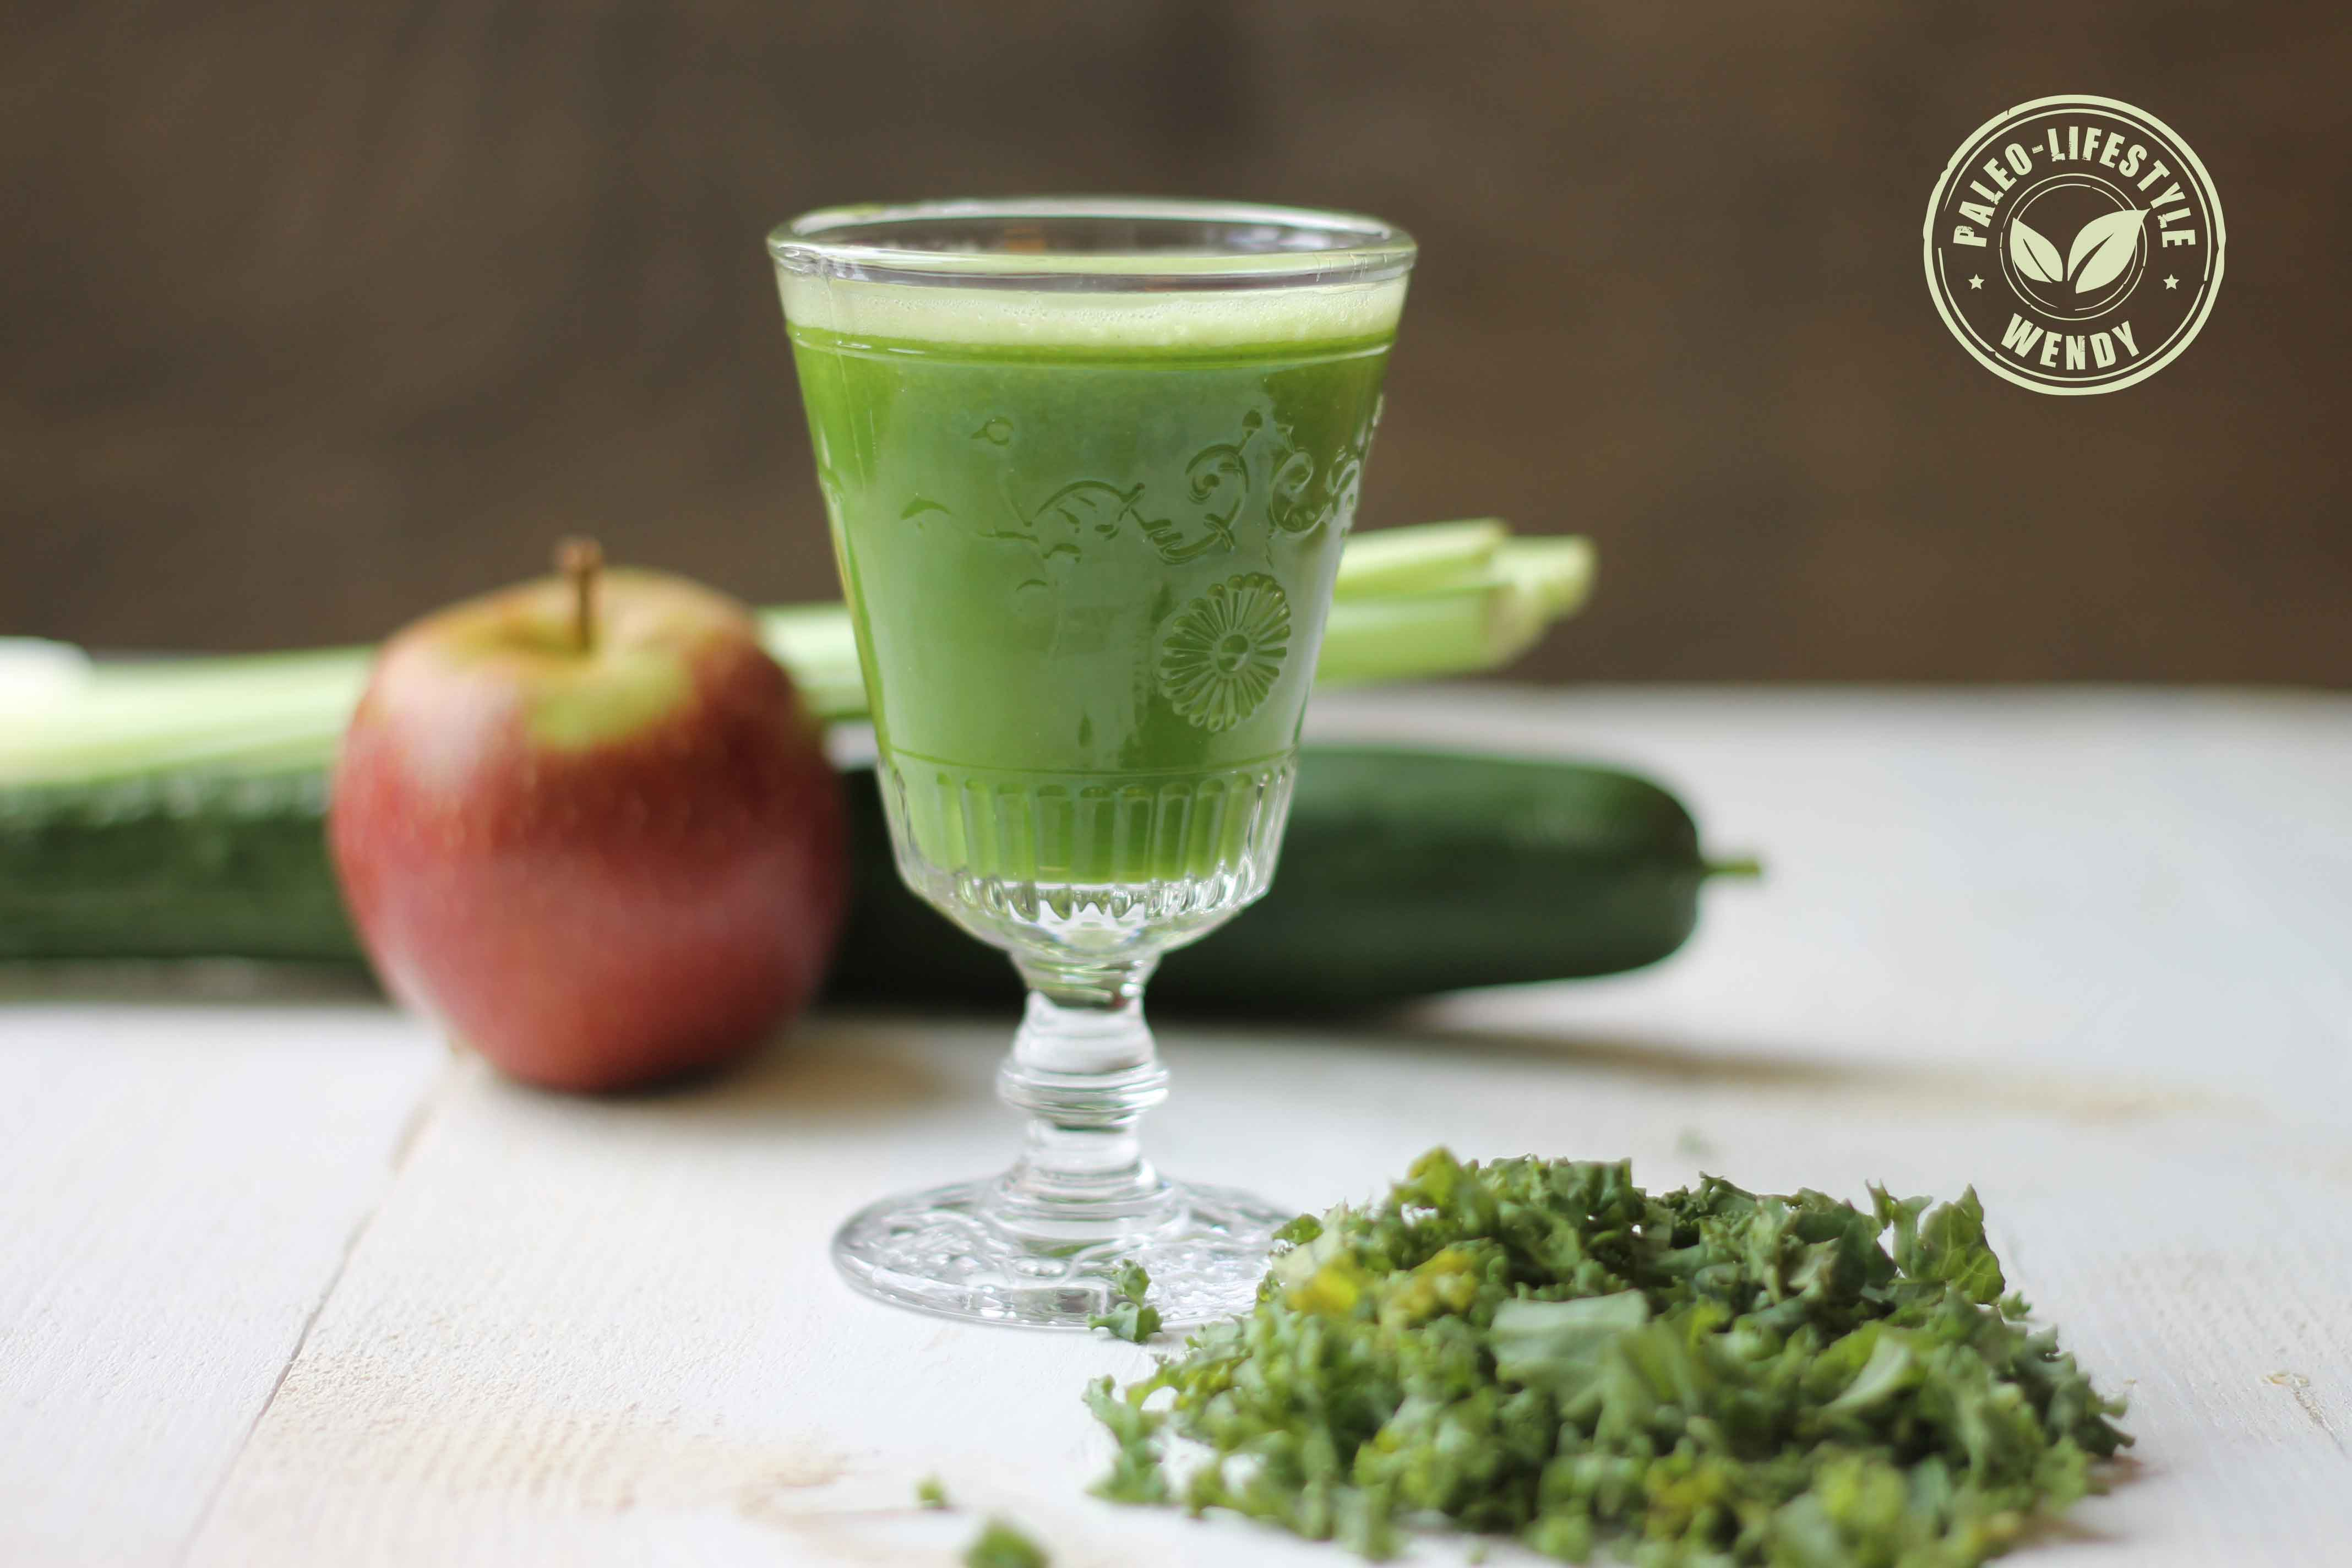 Komkommer-boerenkool-selderij-appel-sap